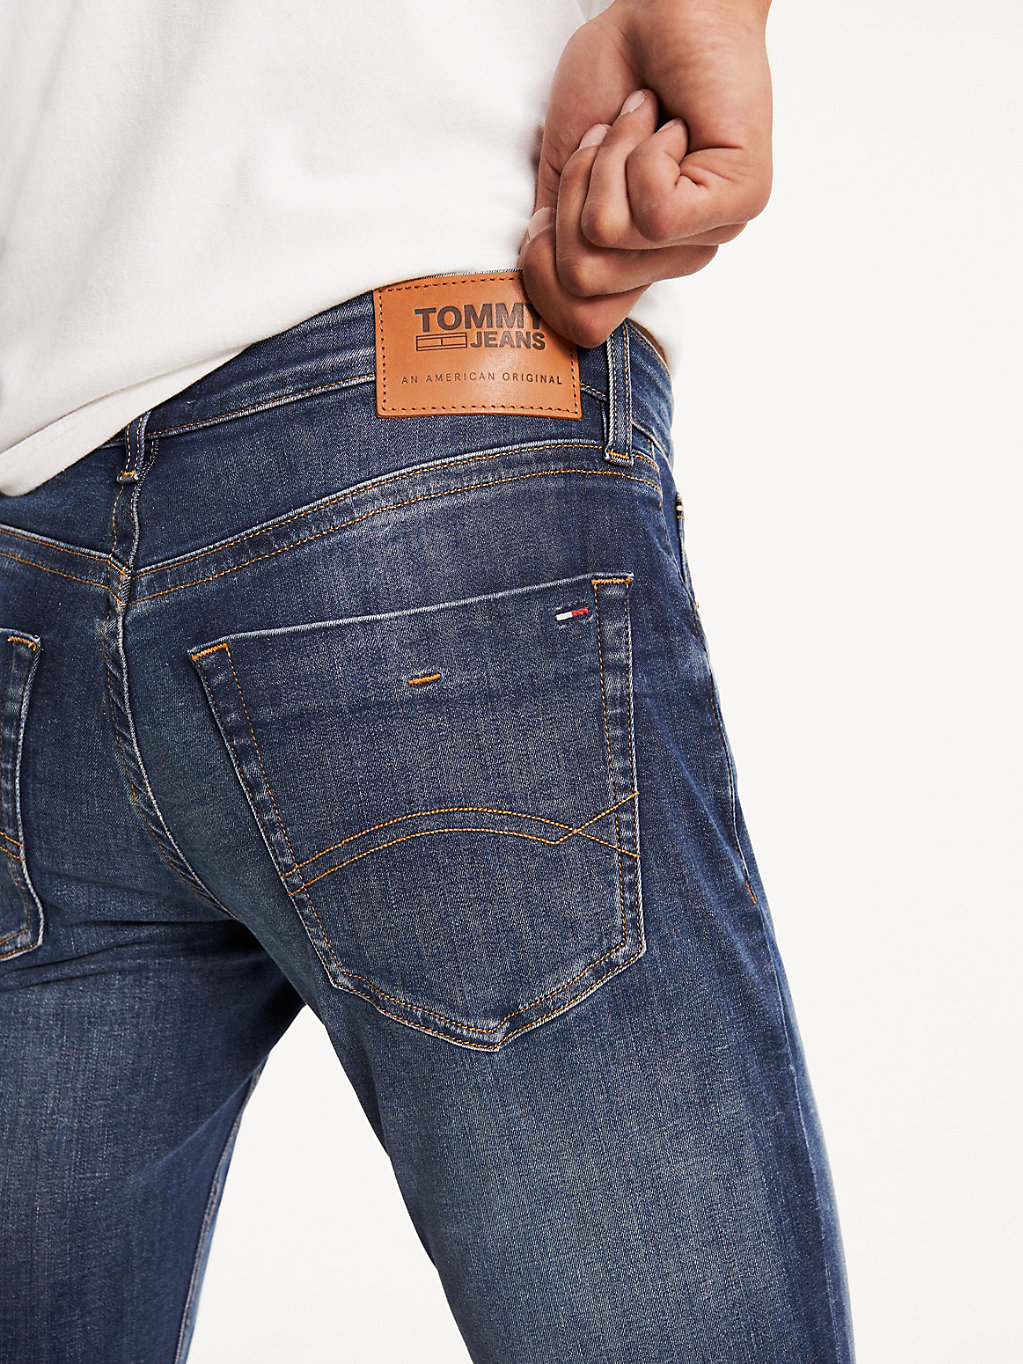 Tommy Hilfiger - Slim Stretch Denim Jeans - 4